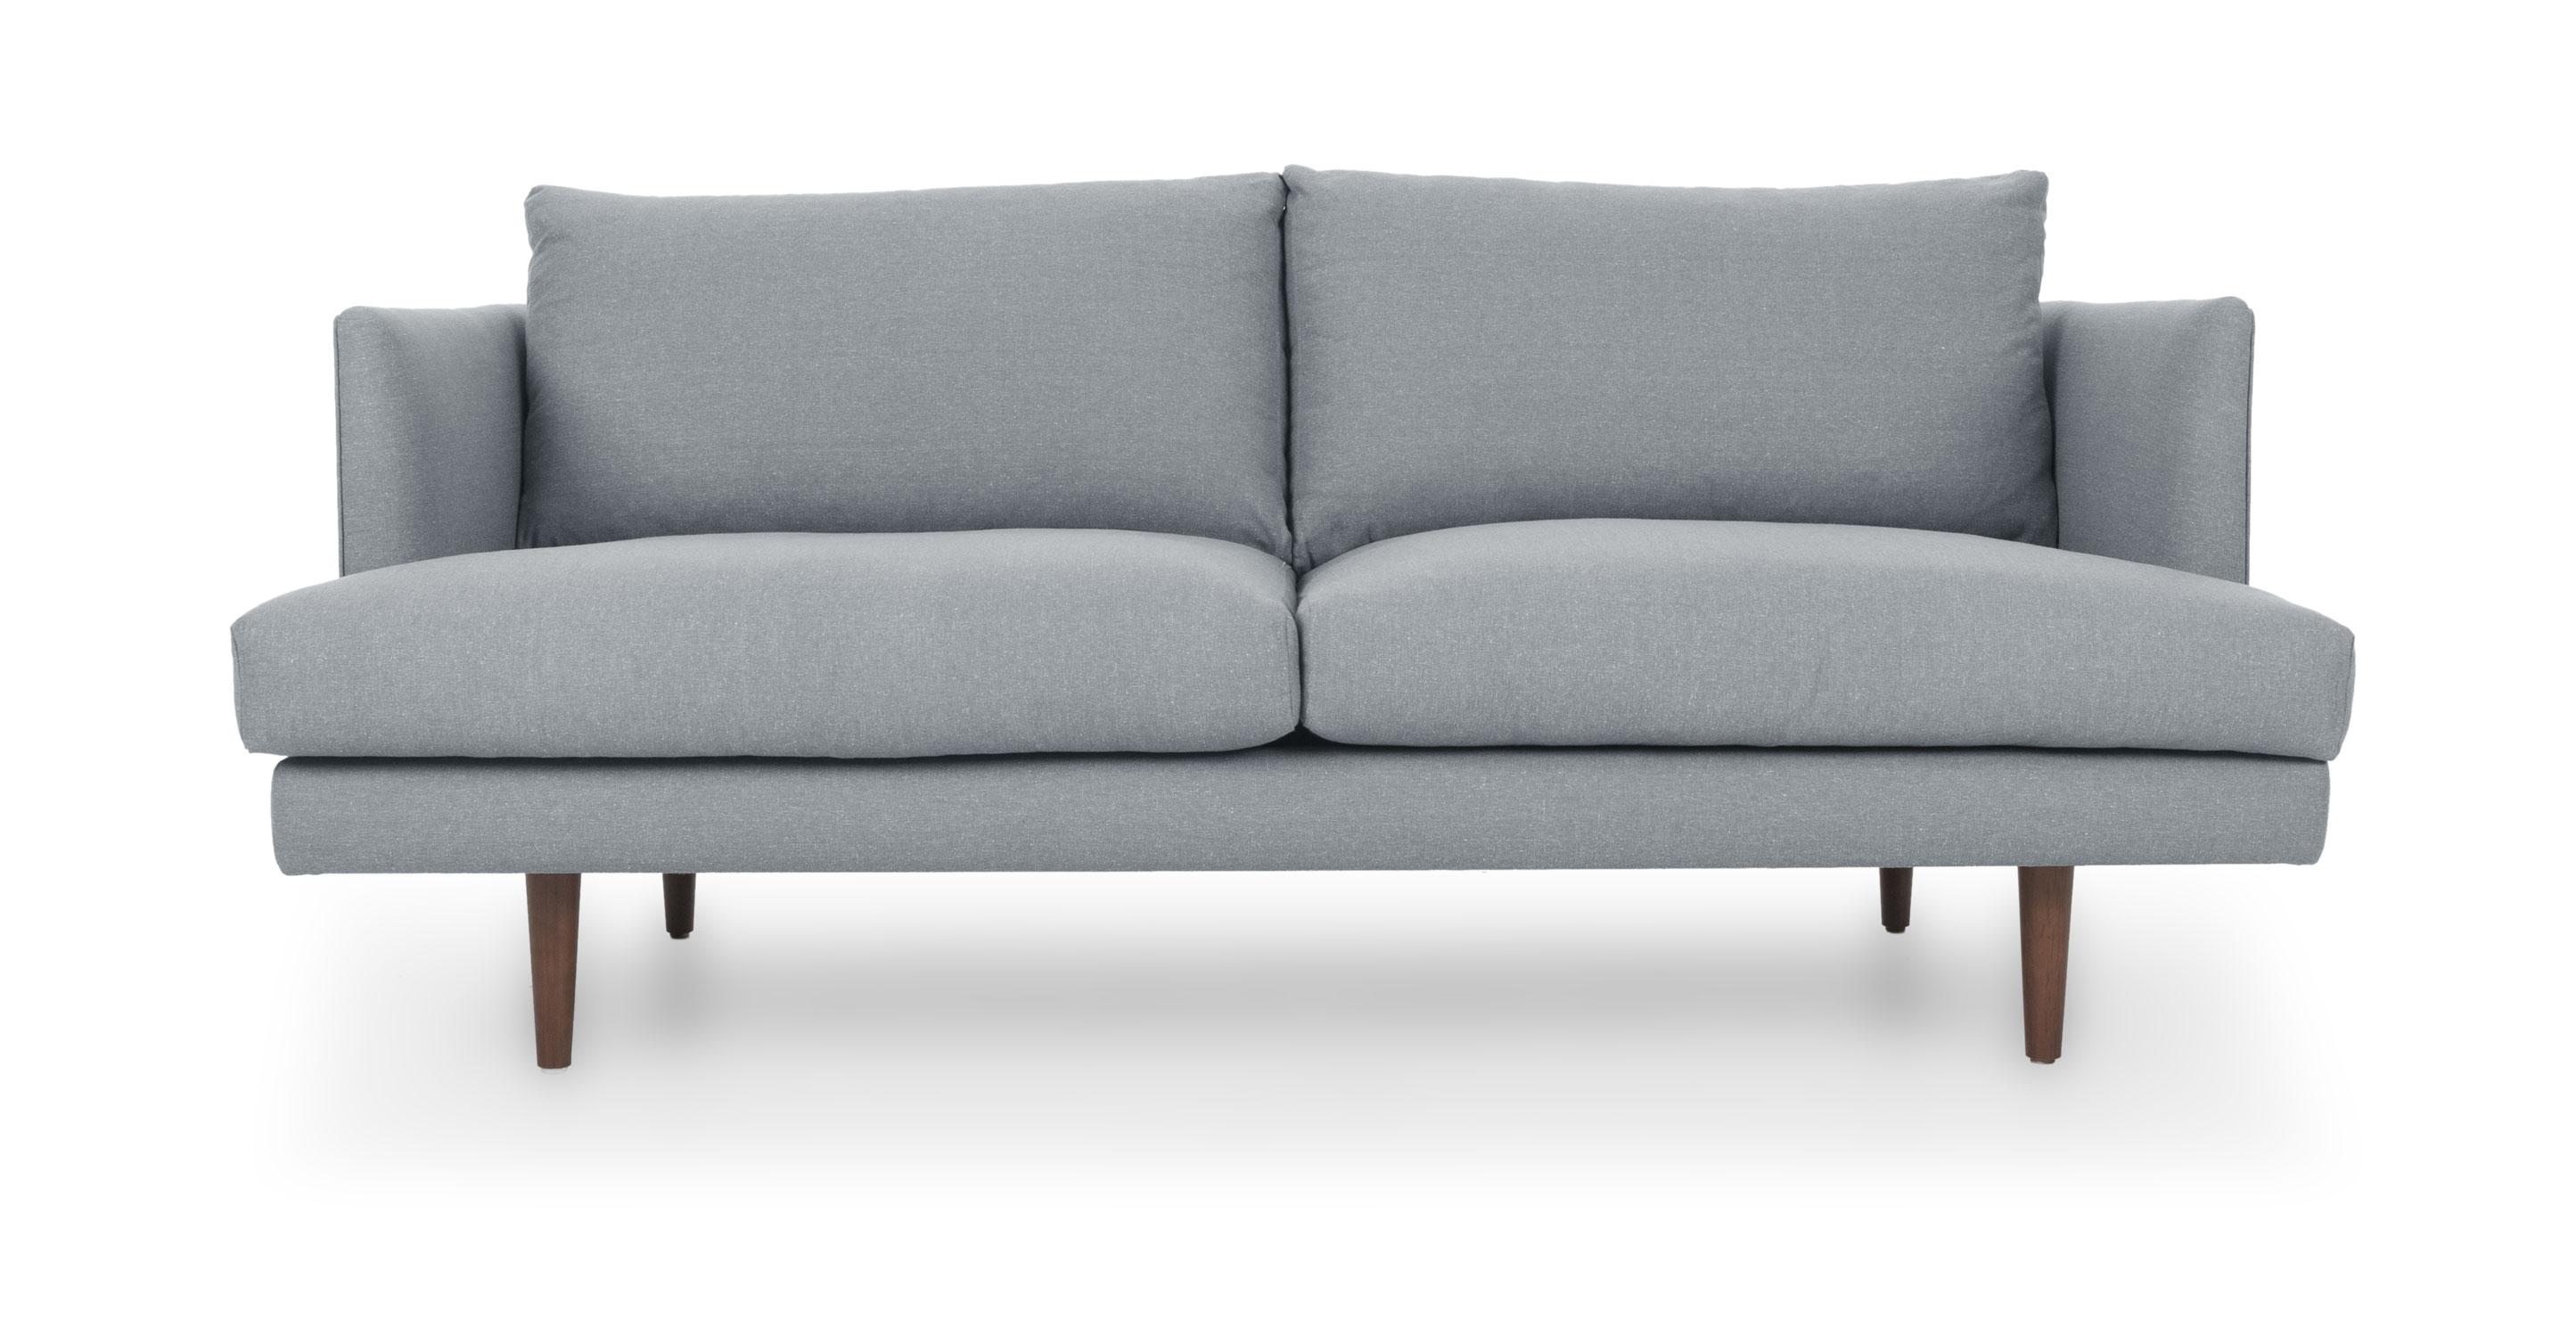 down sofas canada leather corner sofa bed sale carl isle gray loveseat loveseats article modern